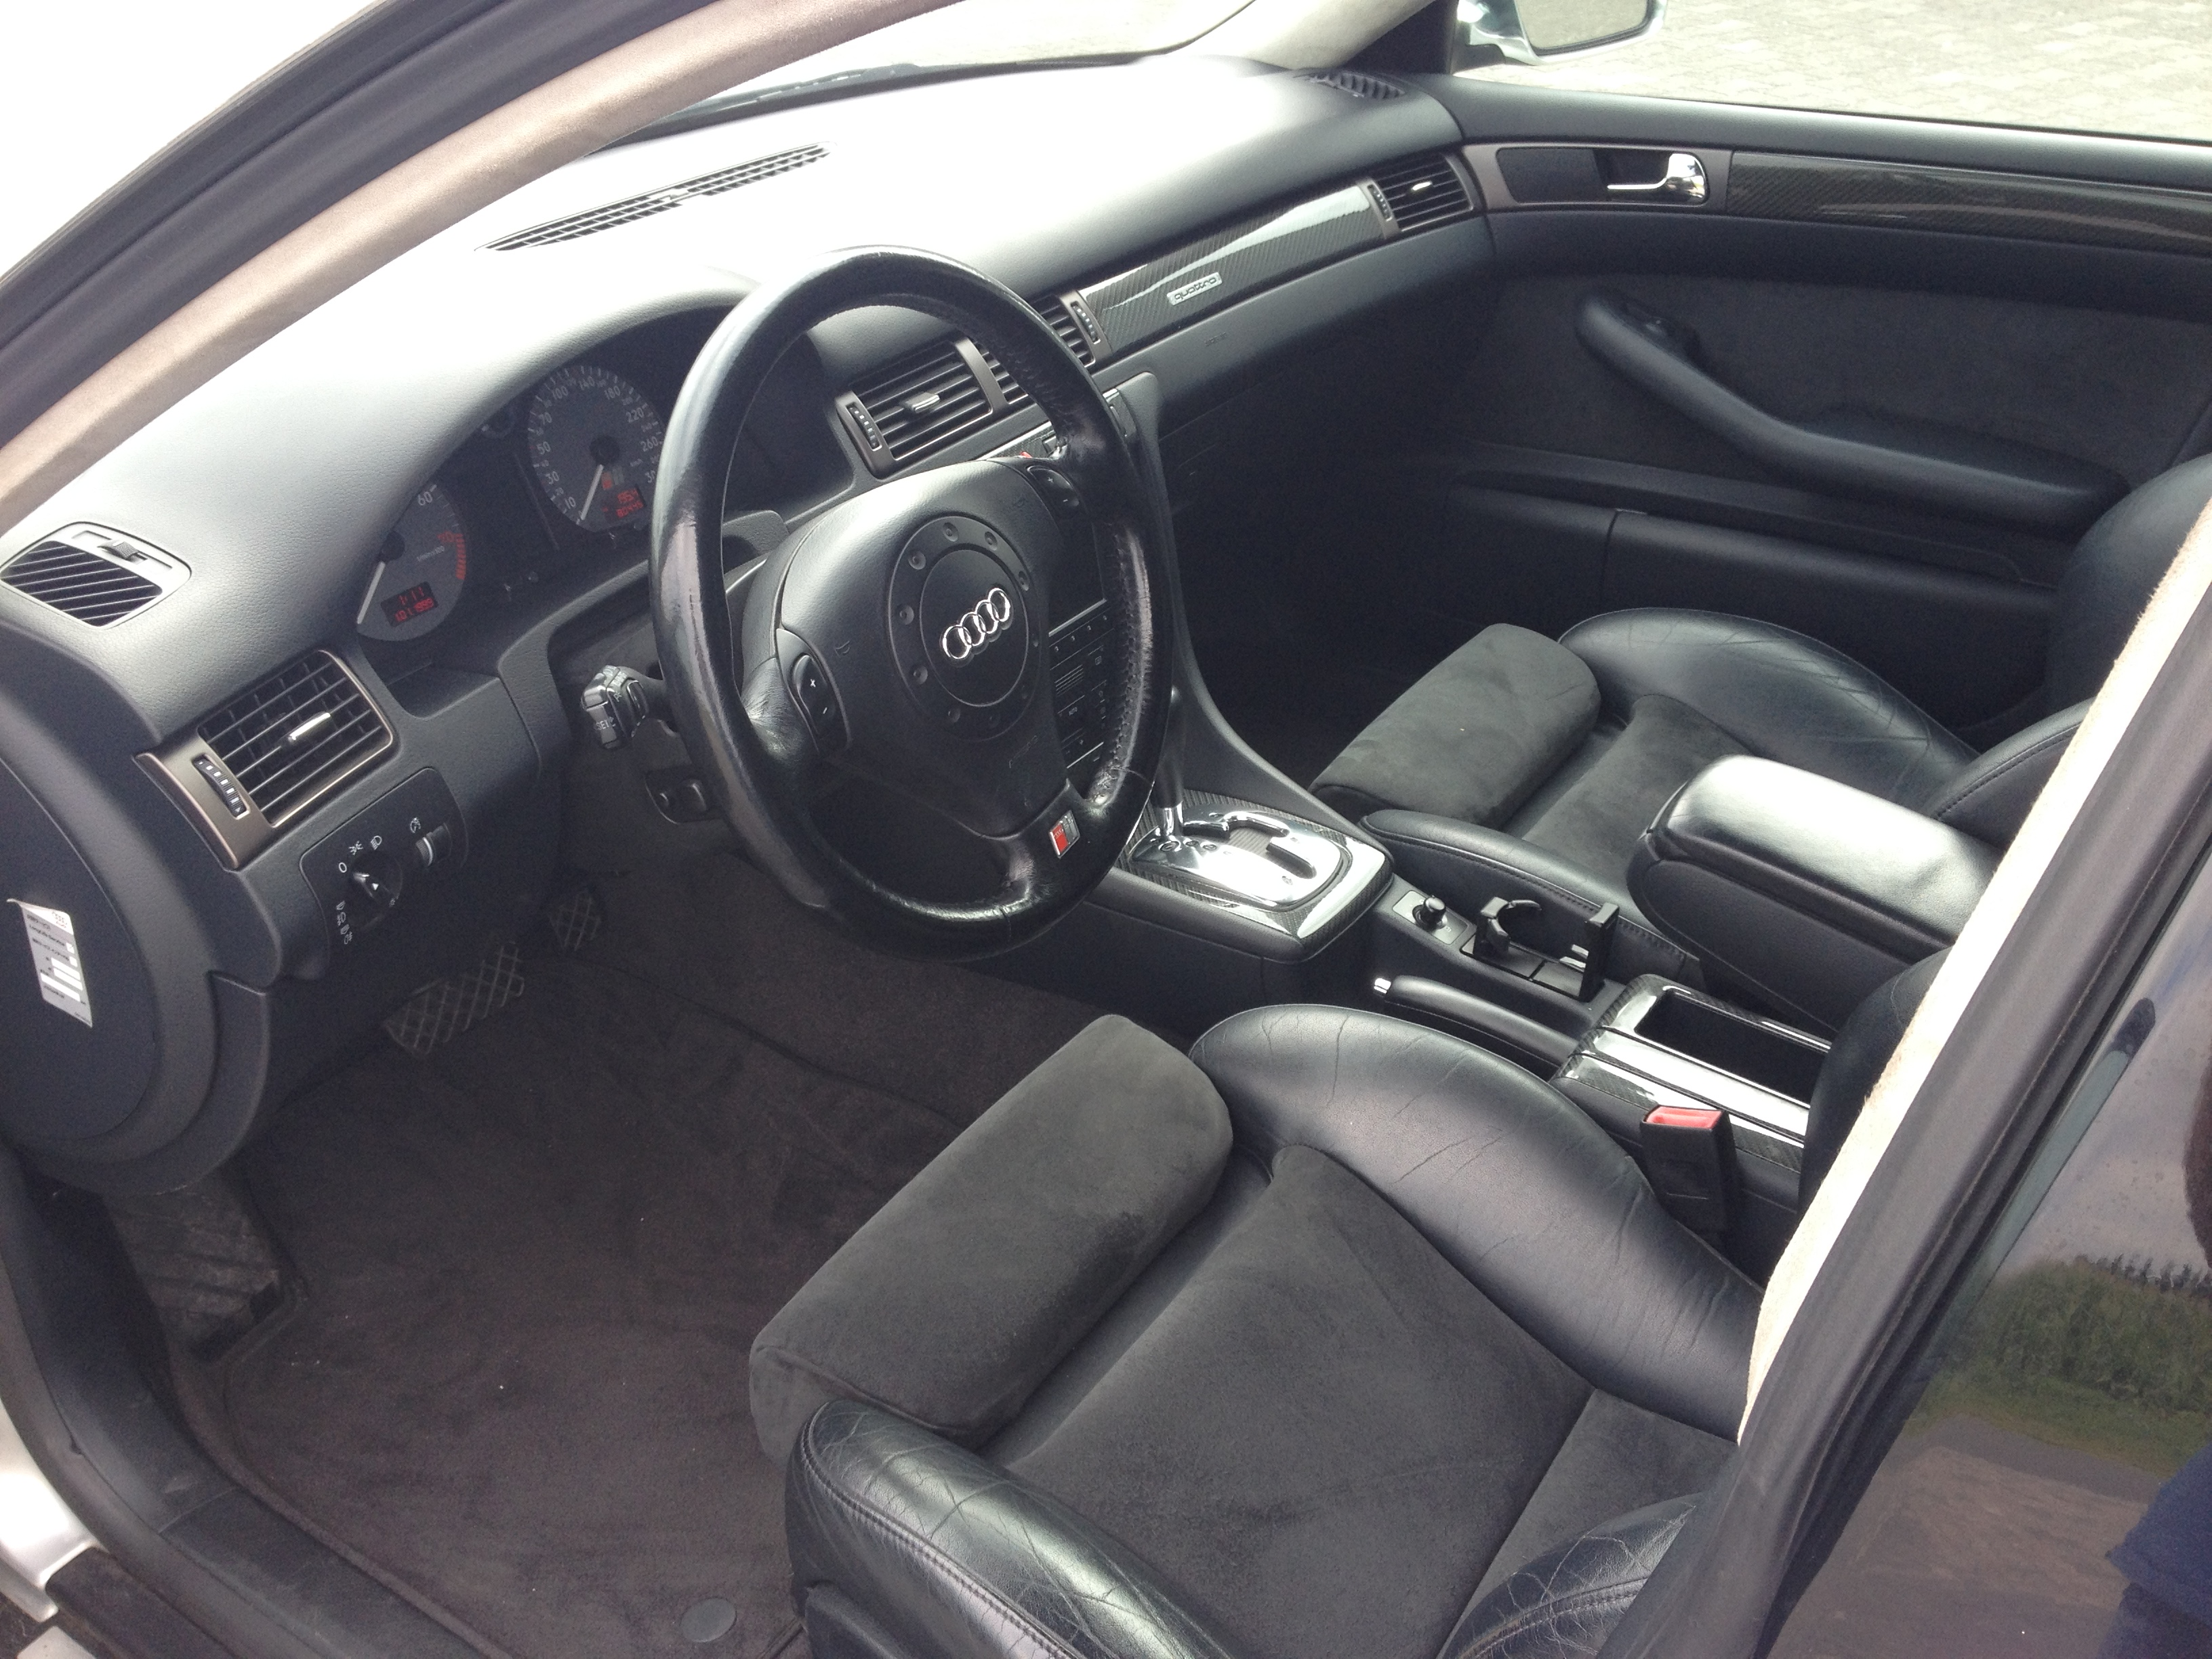 2000 Audi S6 C5 Sedan Review & TestDrive JMSpeedshop